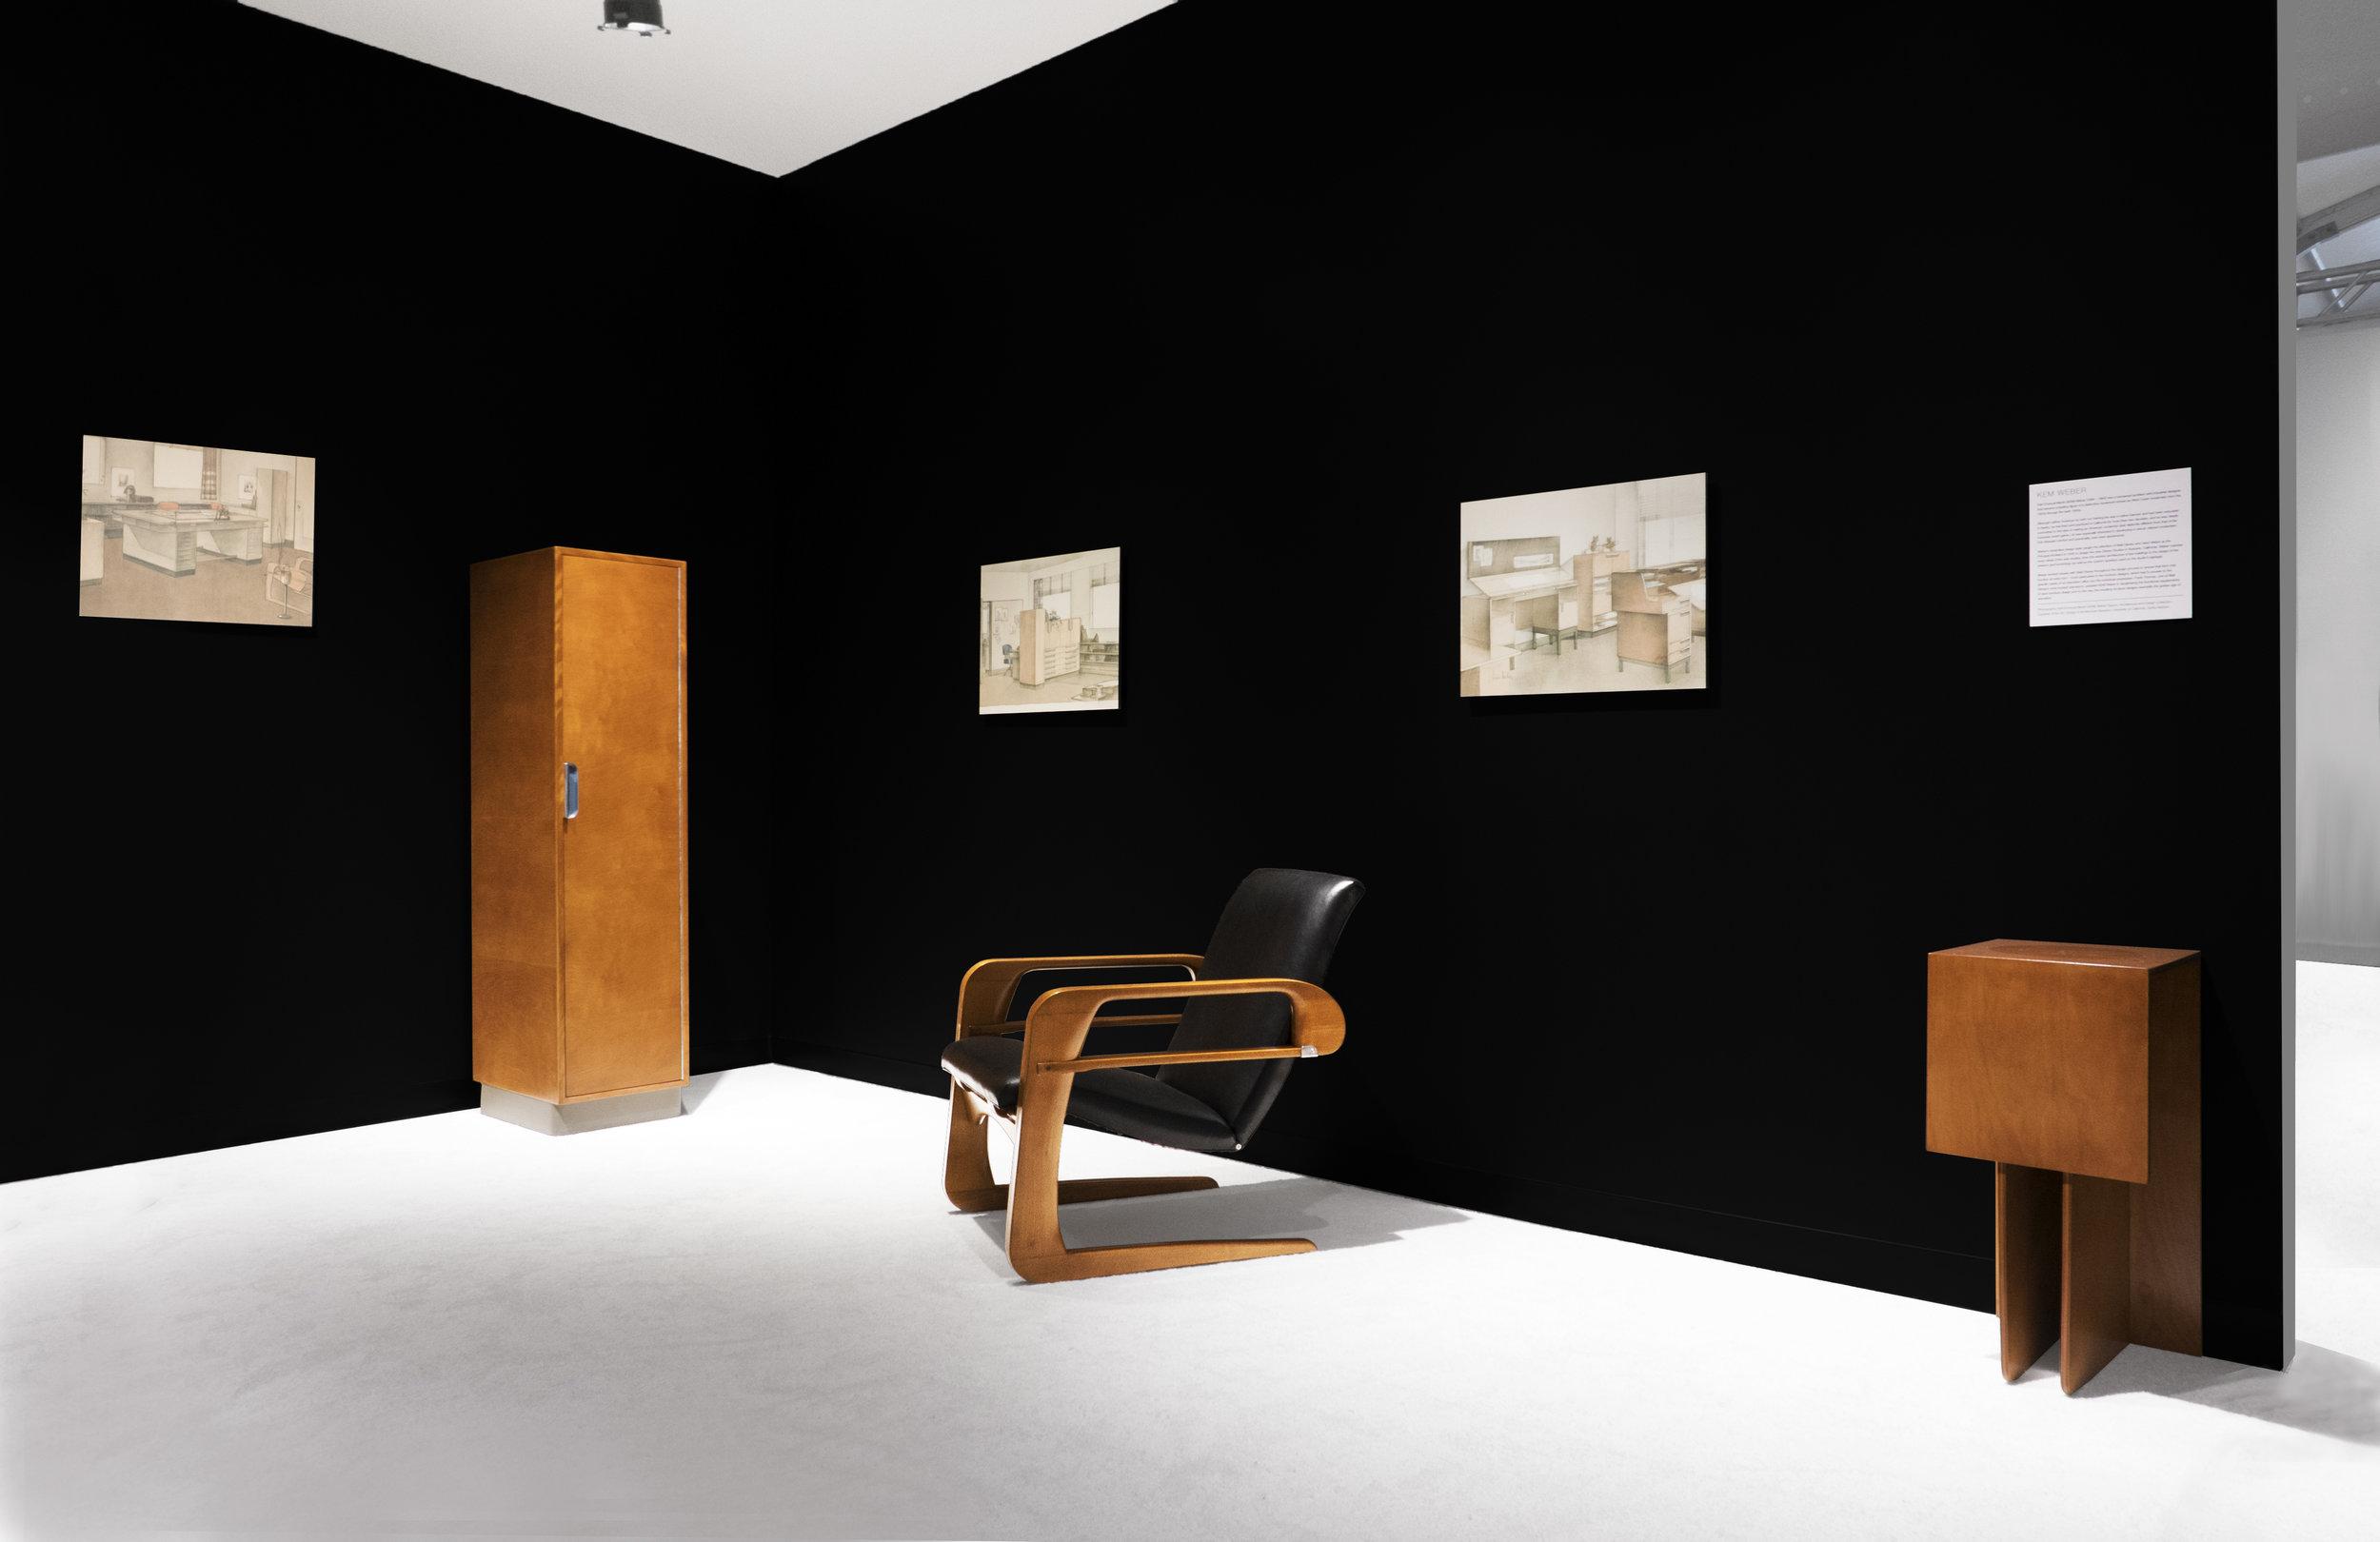 Design Miami 2018_Peter Blake Gallery_Installation View_6.jpg